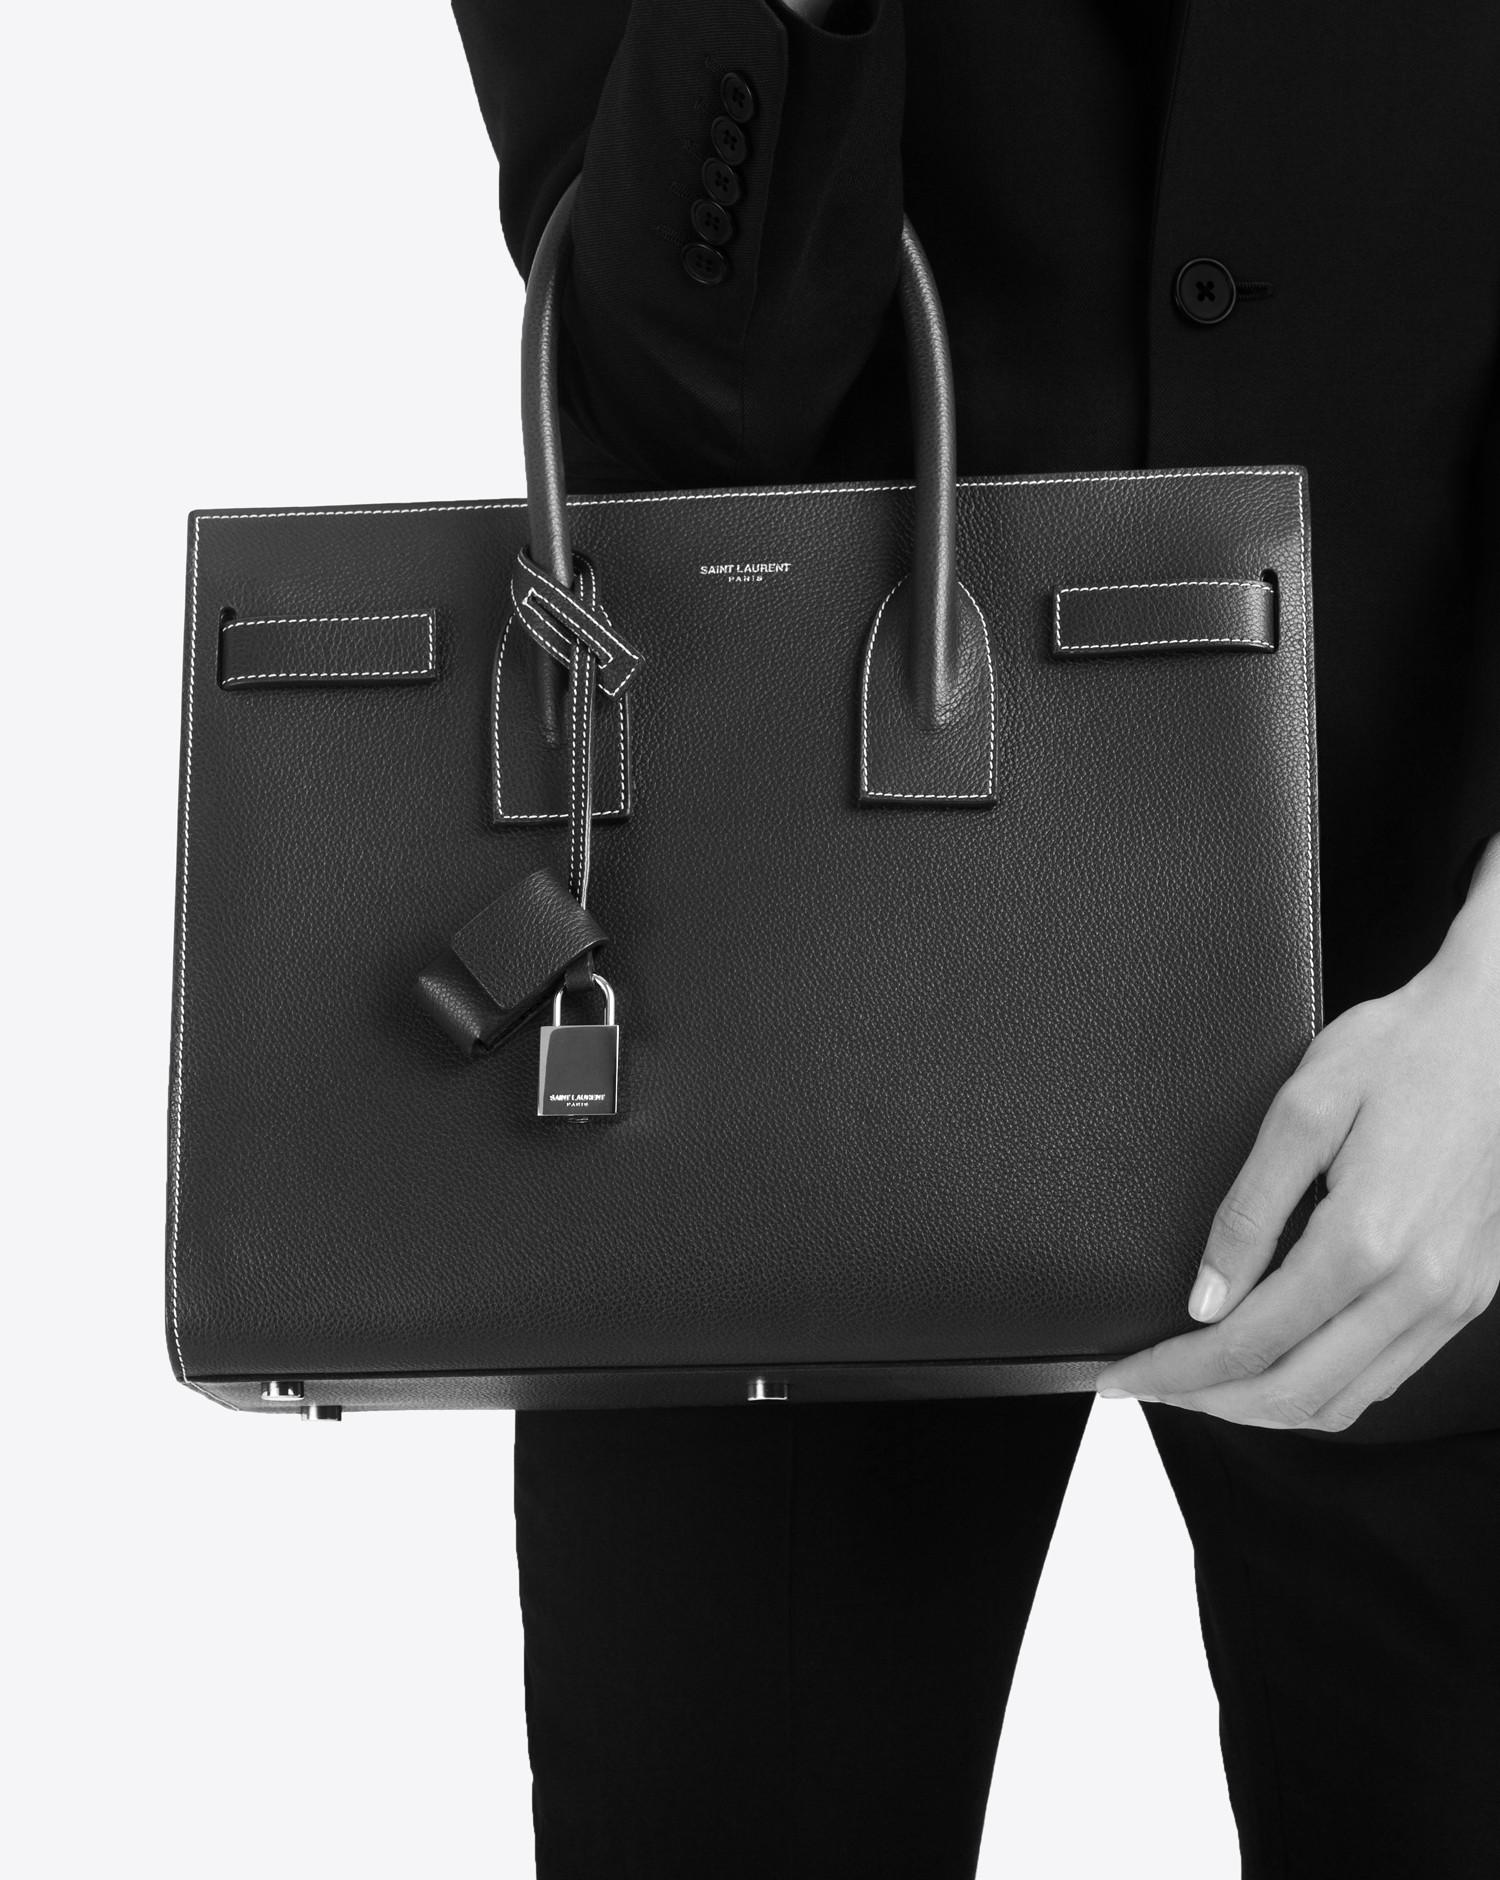 2c78639bdc Saint Laurent Classic Small Sac De Jour Bag In Dark Red Grained Leather